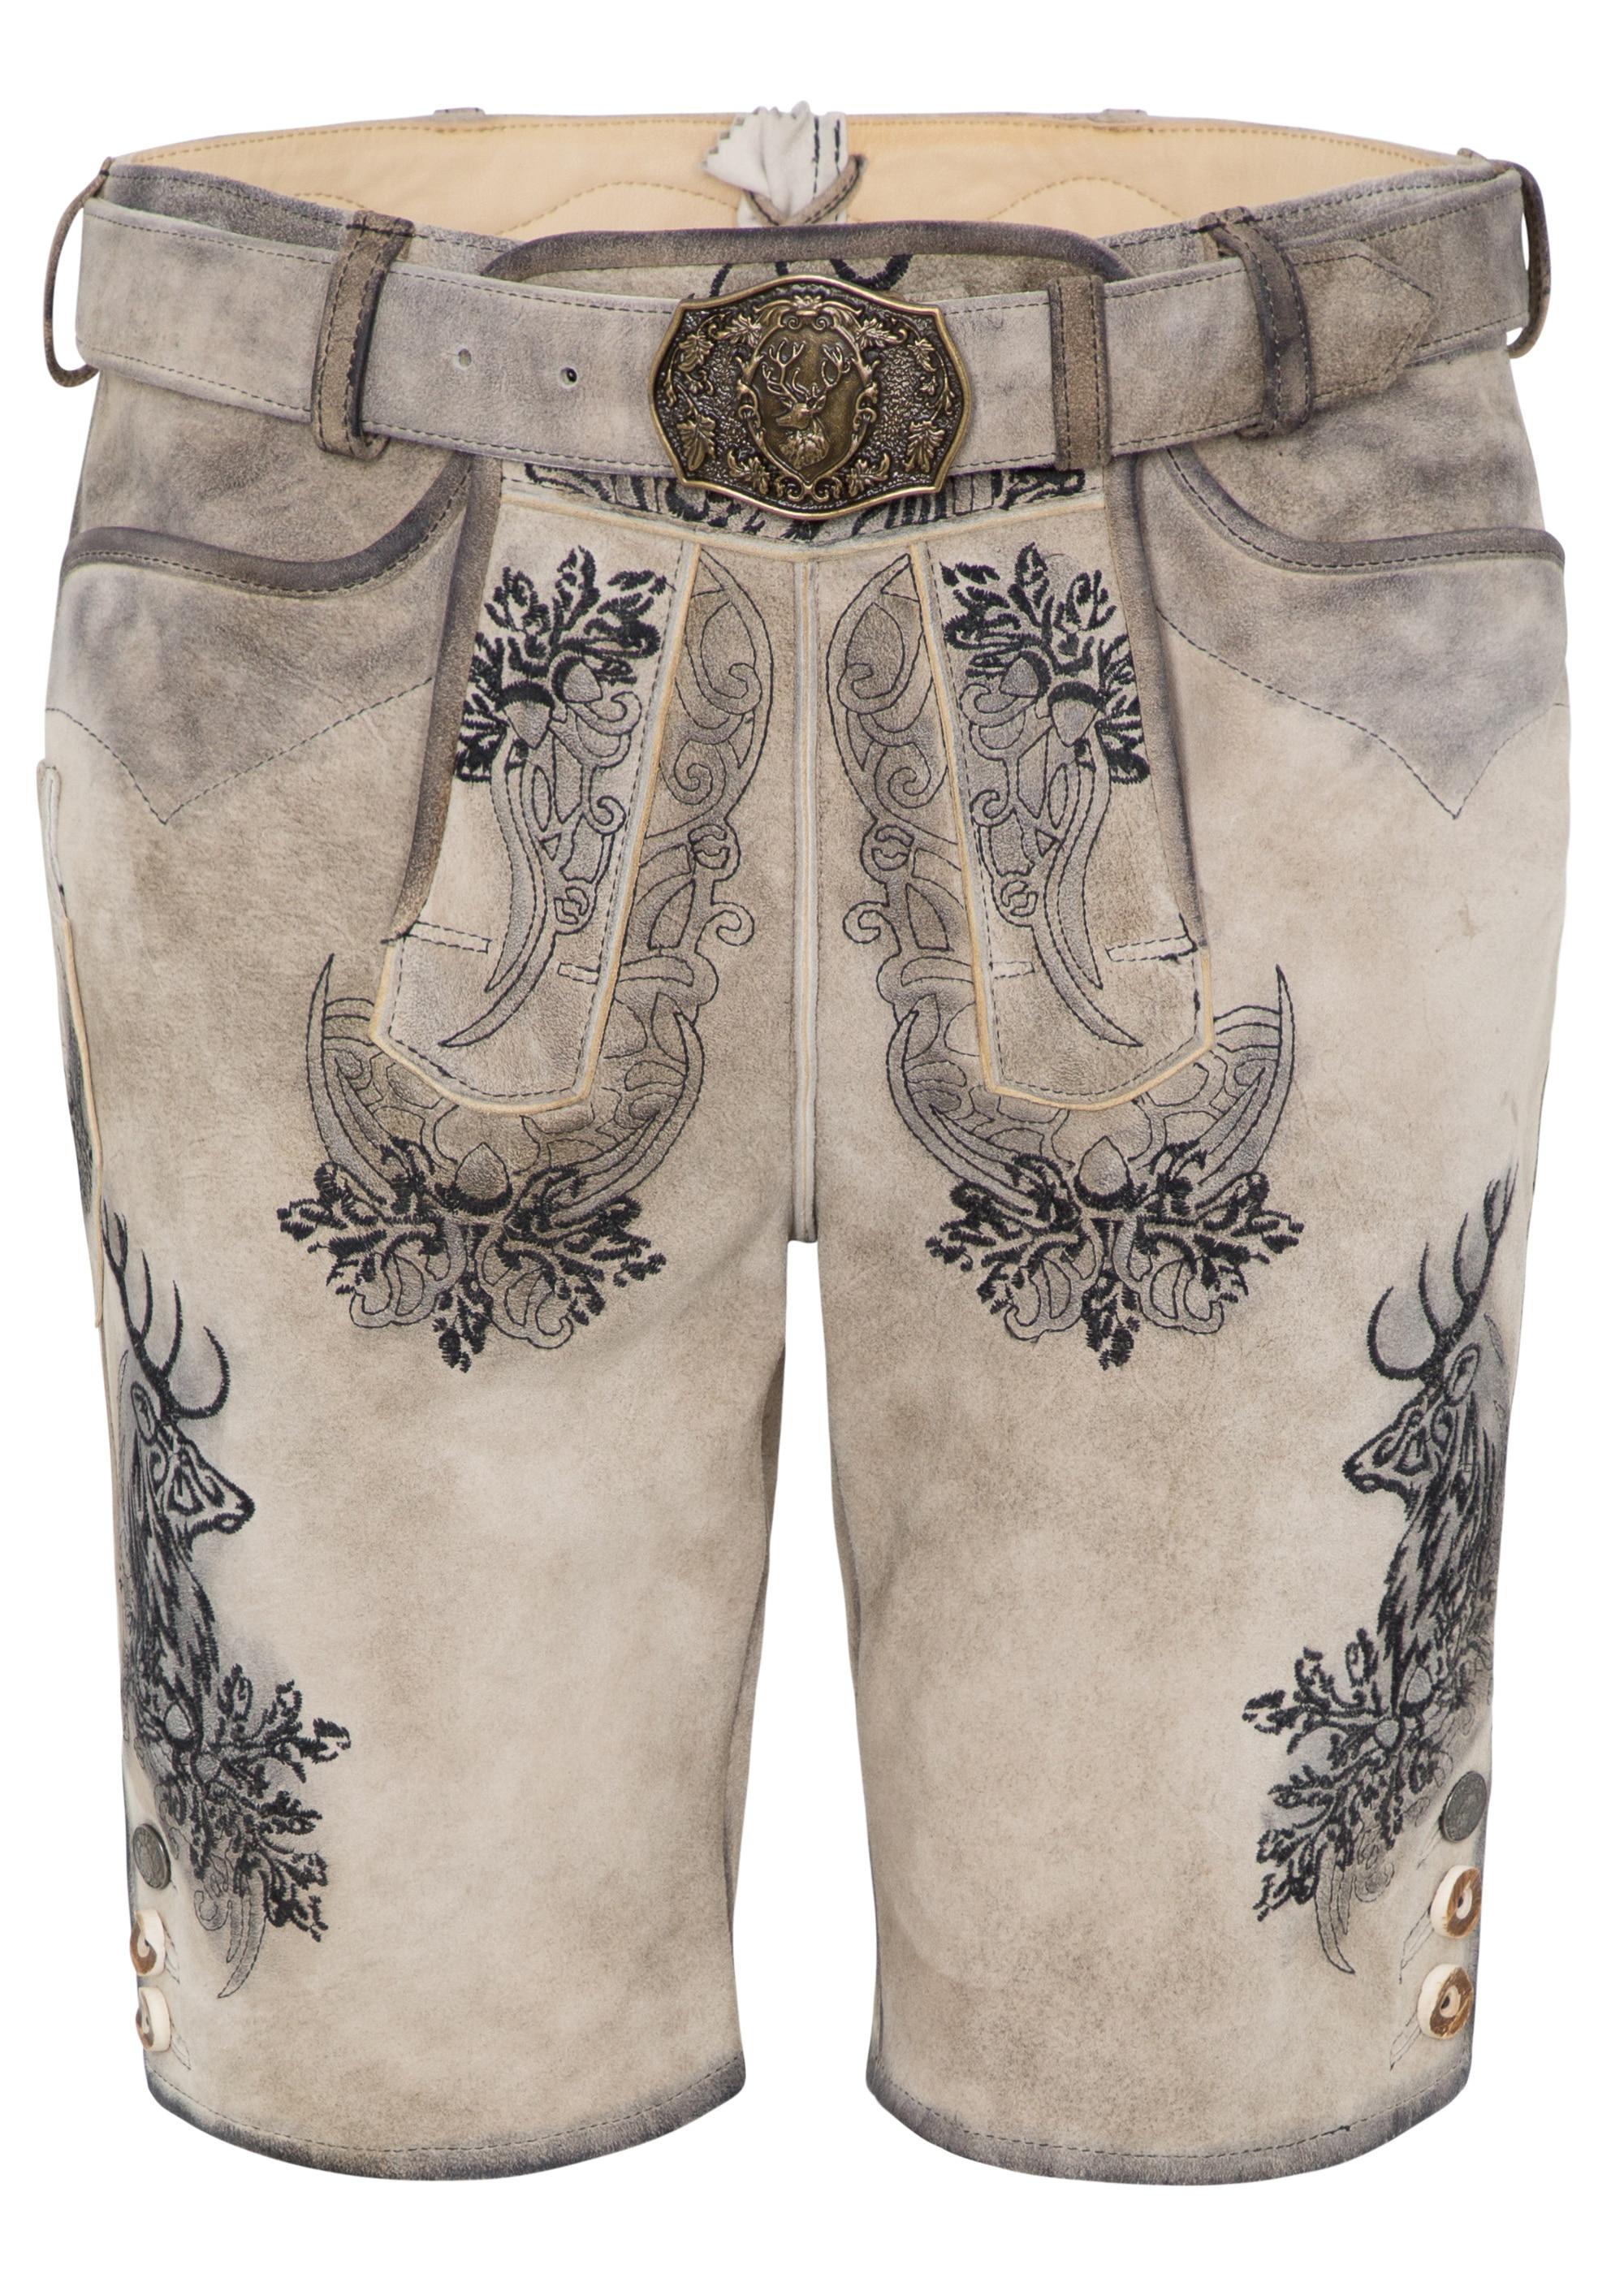 Spieth & Wensky Lederhose Elvis kurz 45 cm | Bekleidung > Hosen > Lederhosen | Leder | Spieth & Wensky